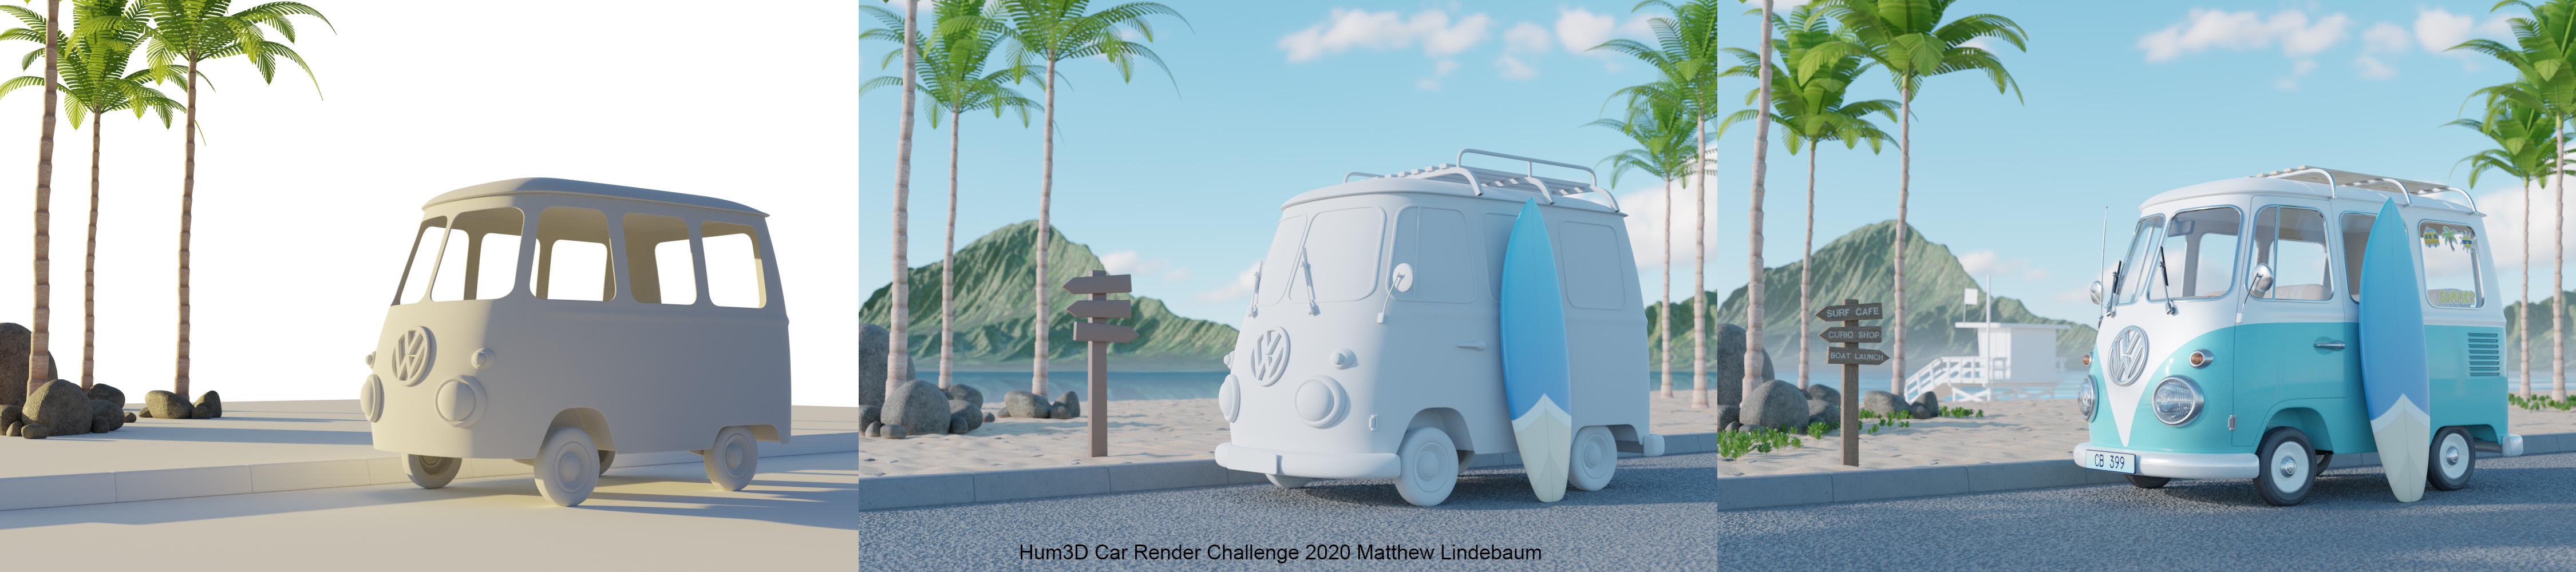 2020 Car render challenge